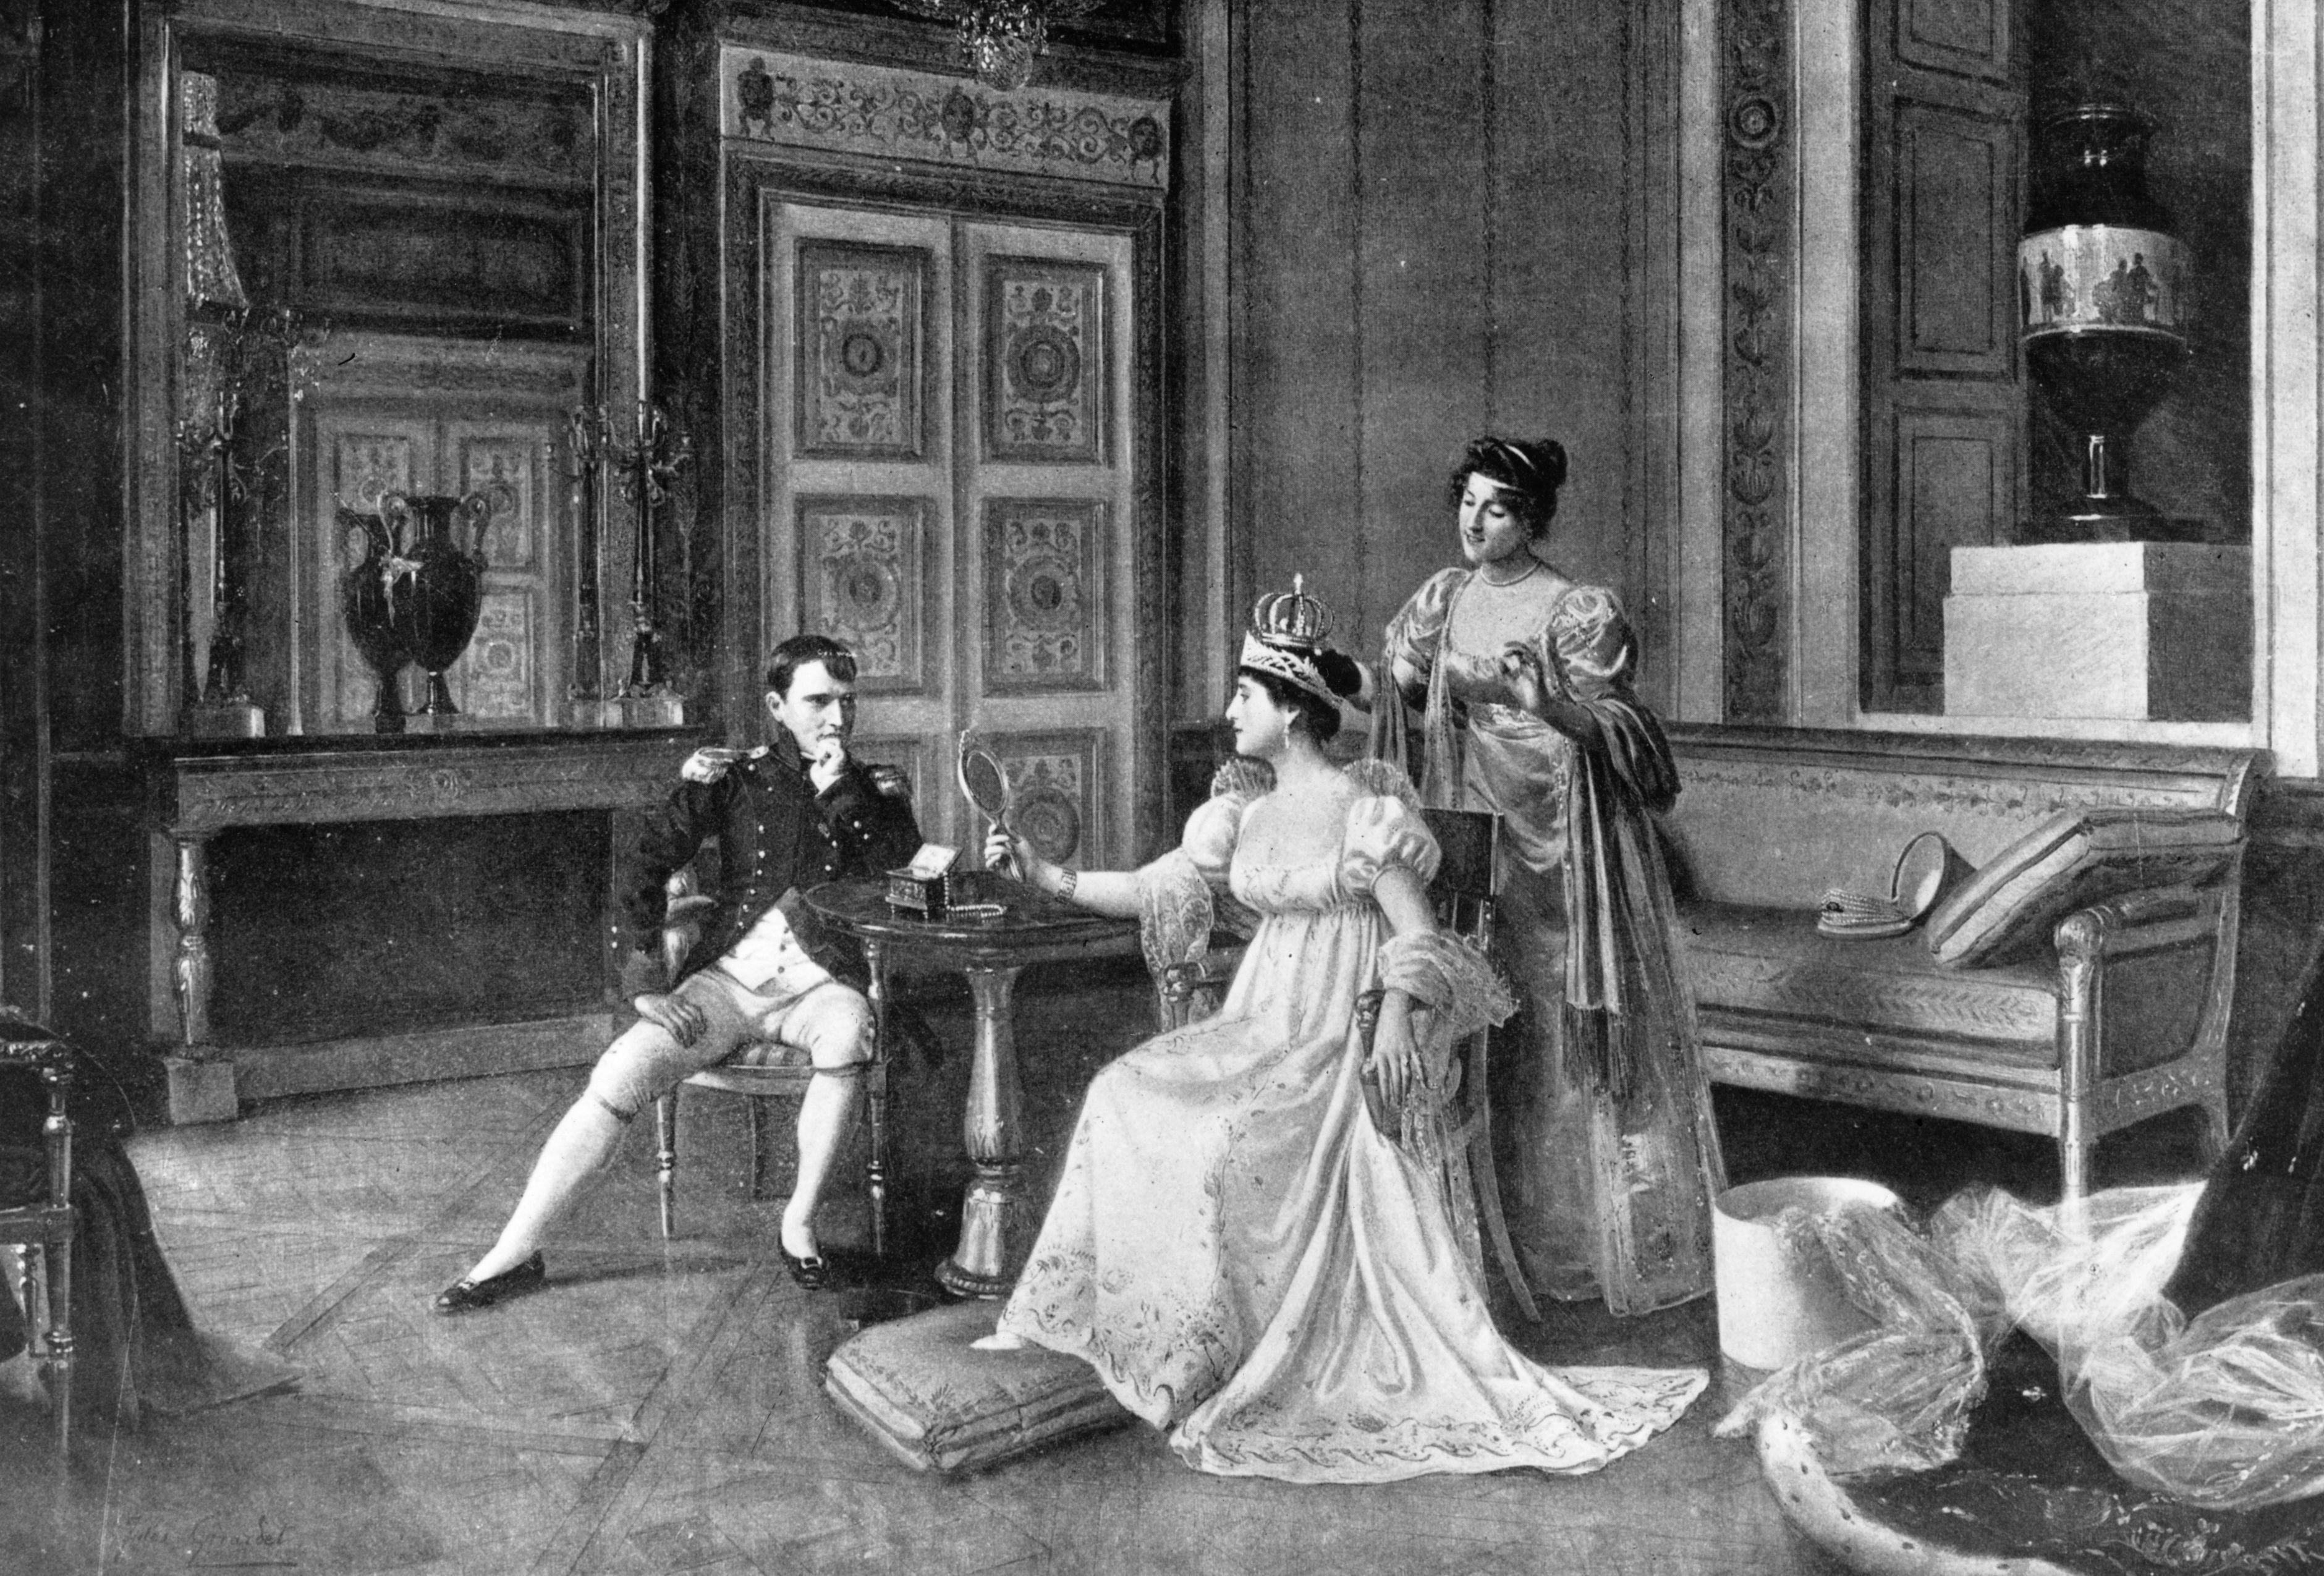 Napoleon Bonaparte (1769 - 1821) and his wife Josephine De Beauharnais